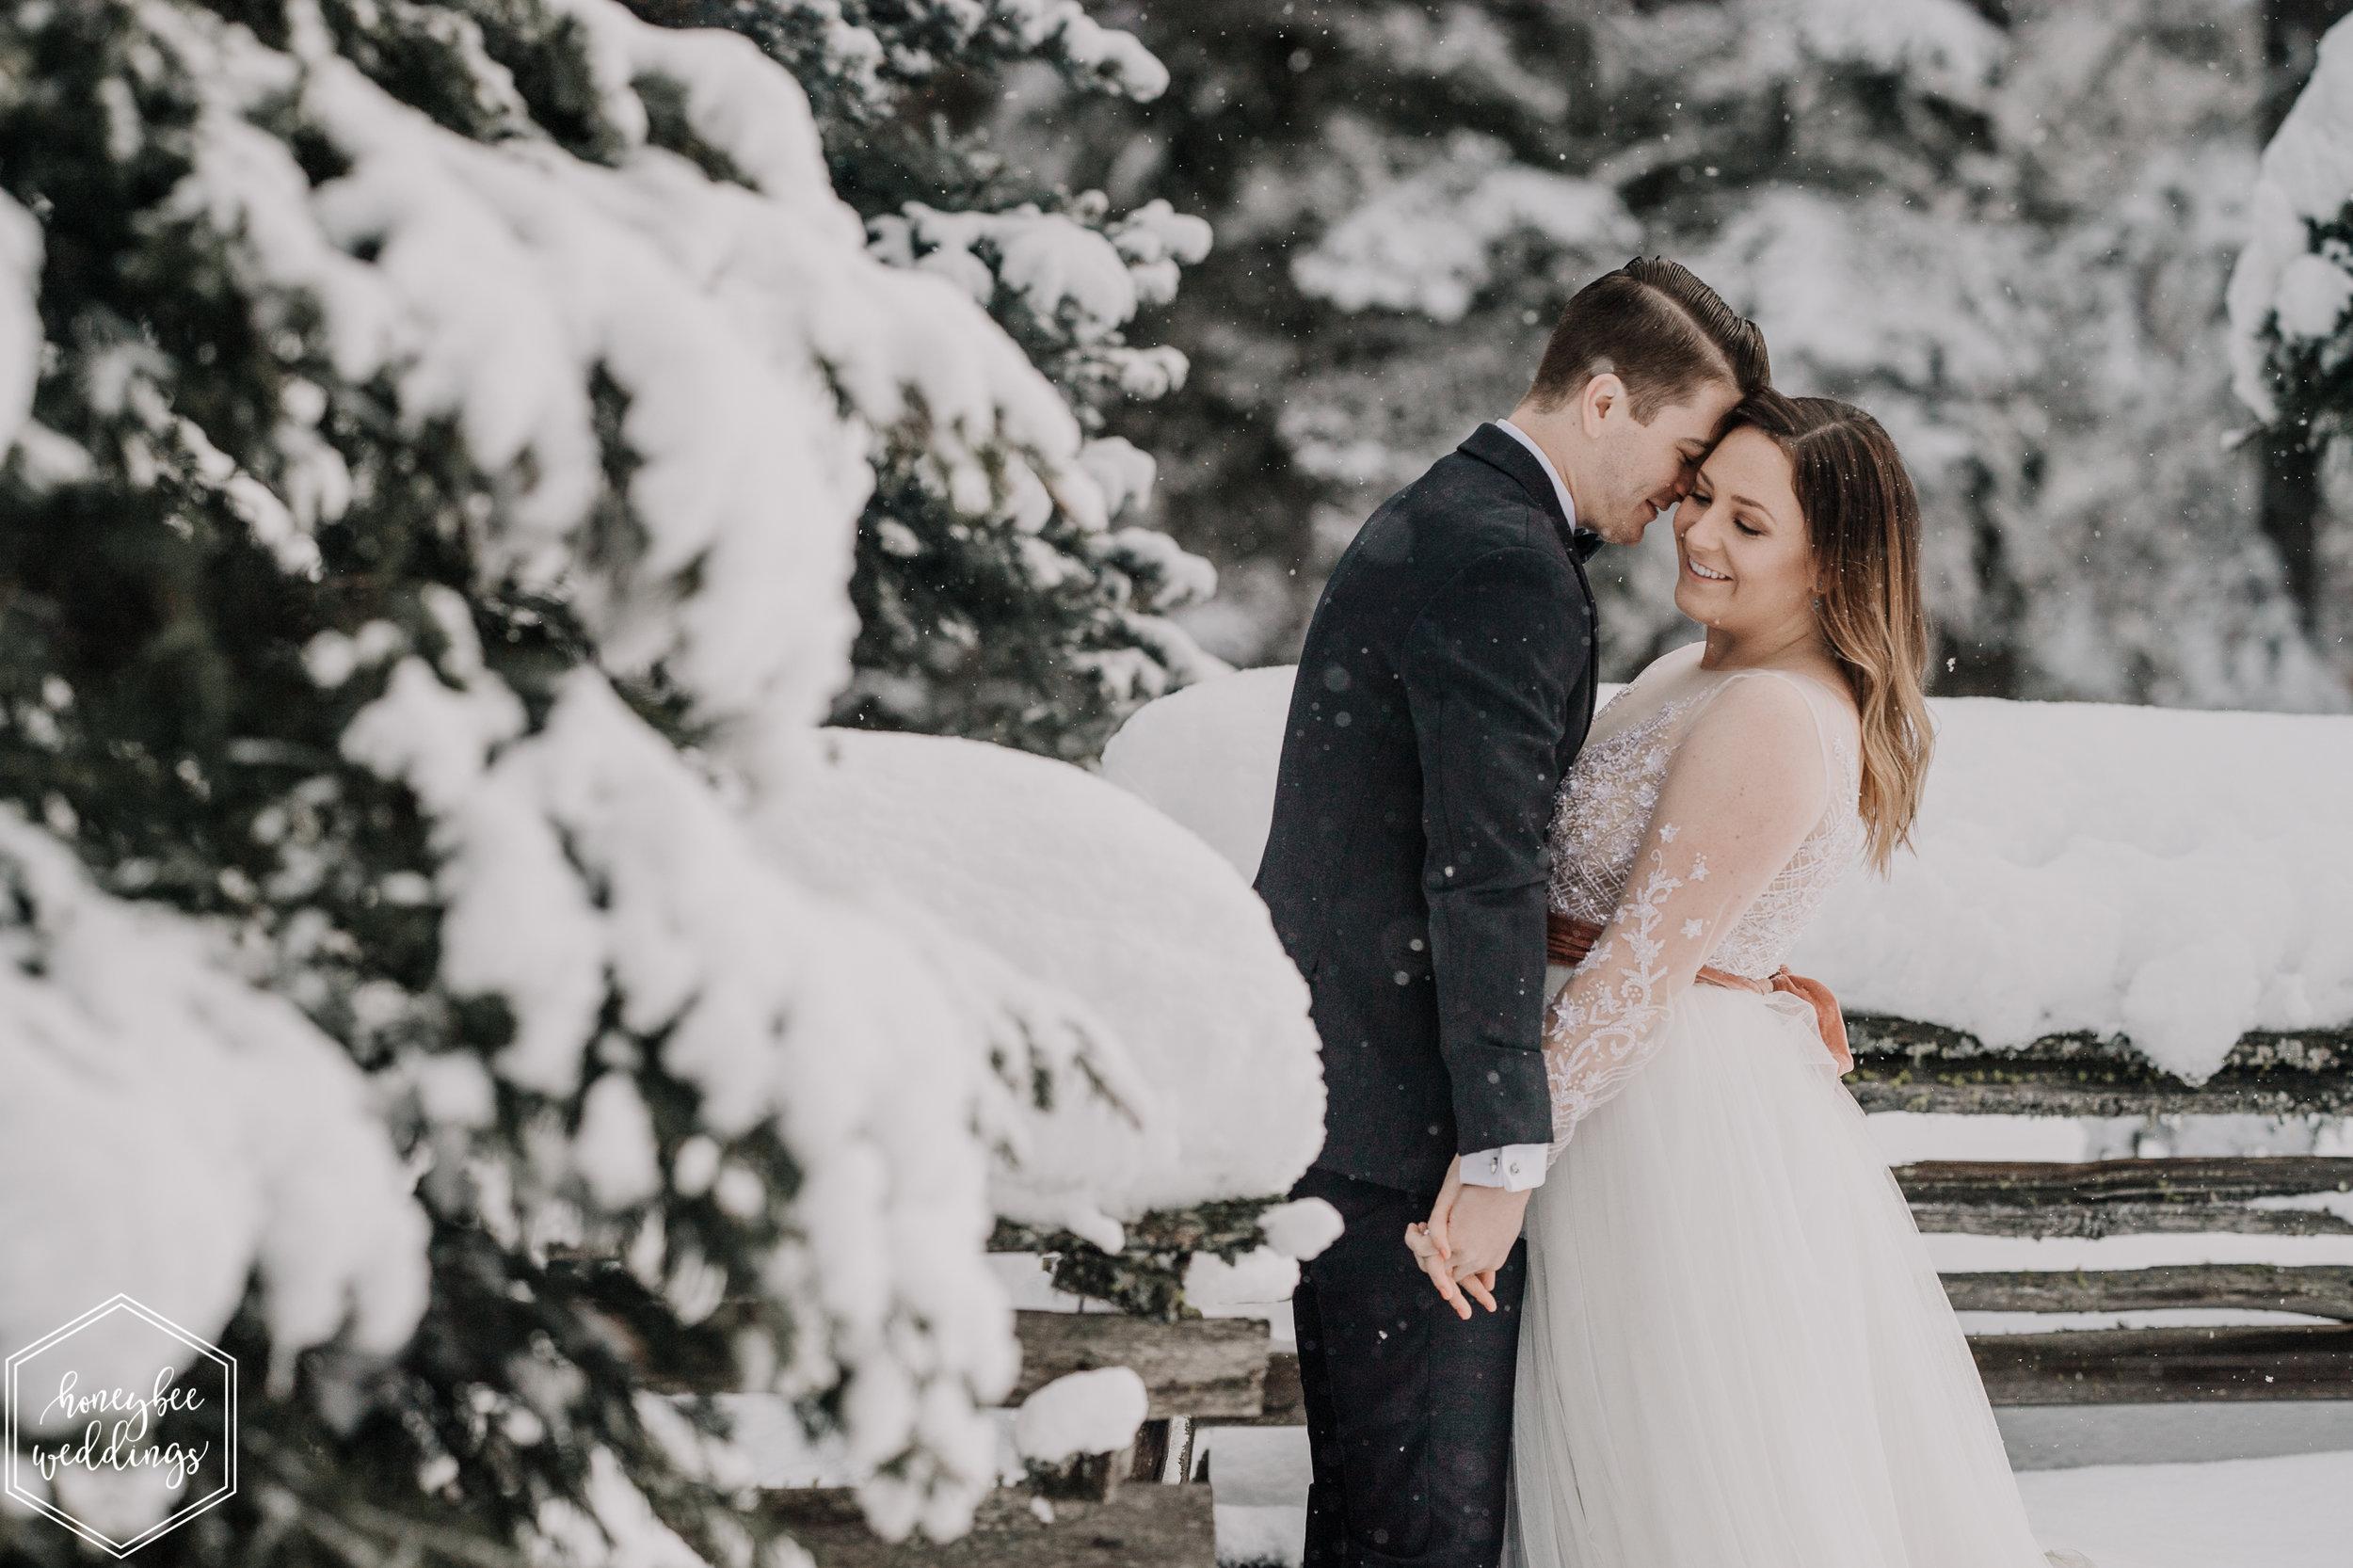 0338Montana Wedding Photographer_Missoula Winter Wedding_Wedding at Fort Missoula_Meri & Carter_January 21, 2019-50.jpg